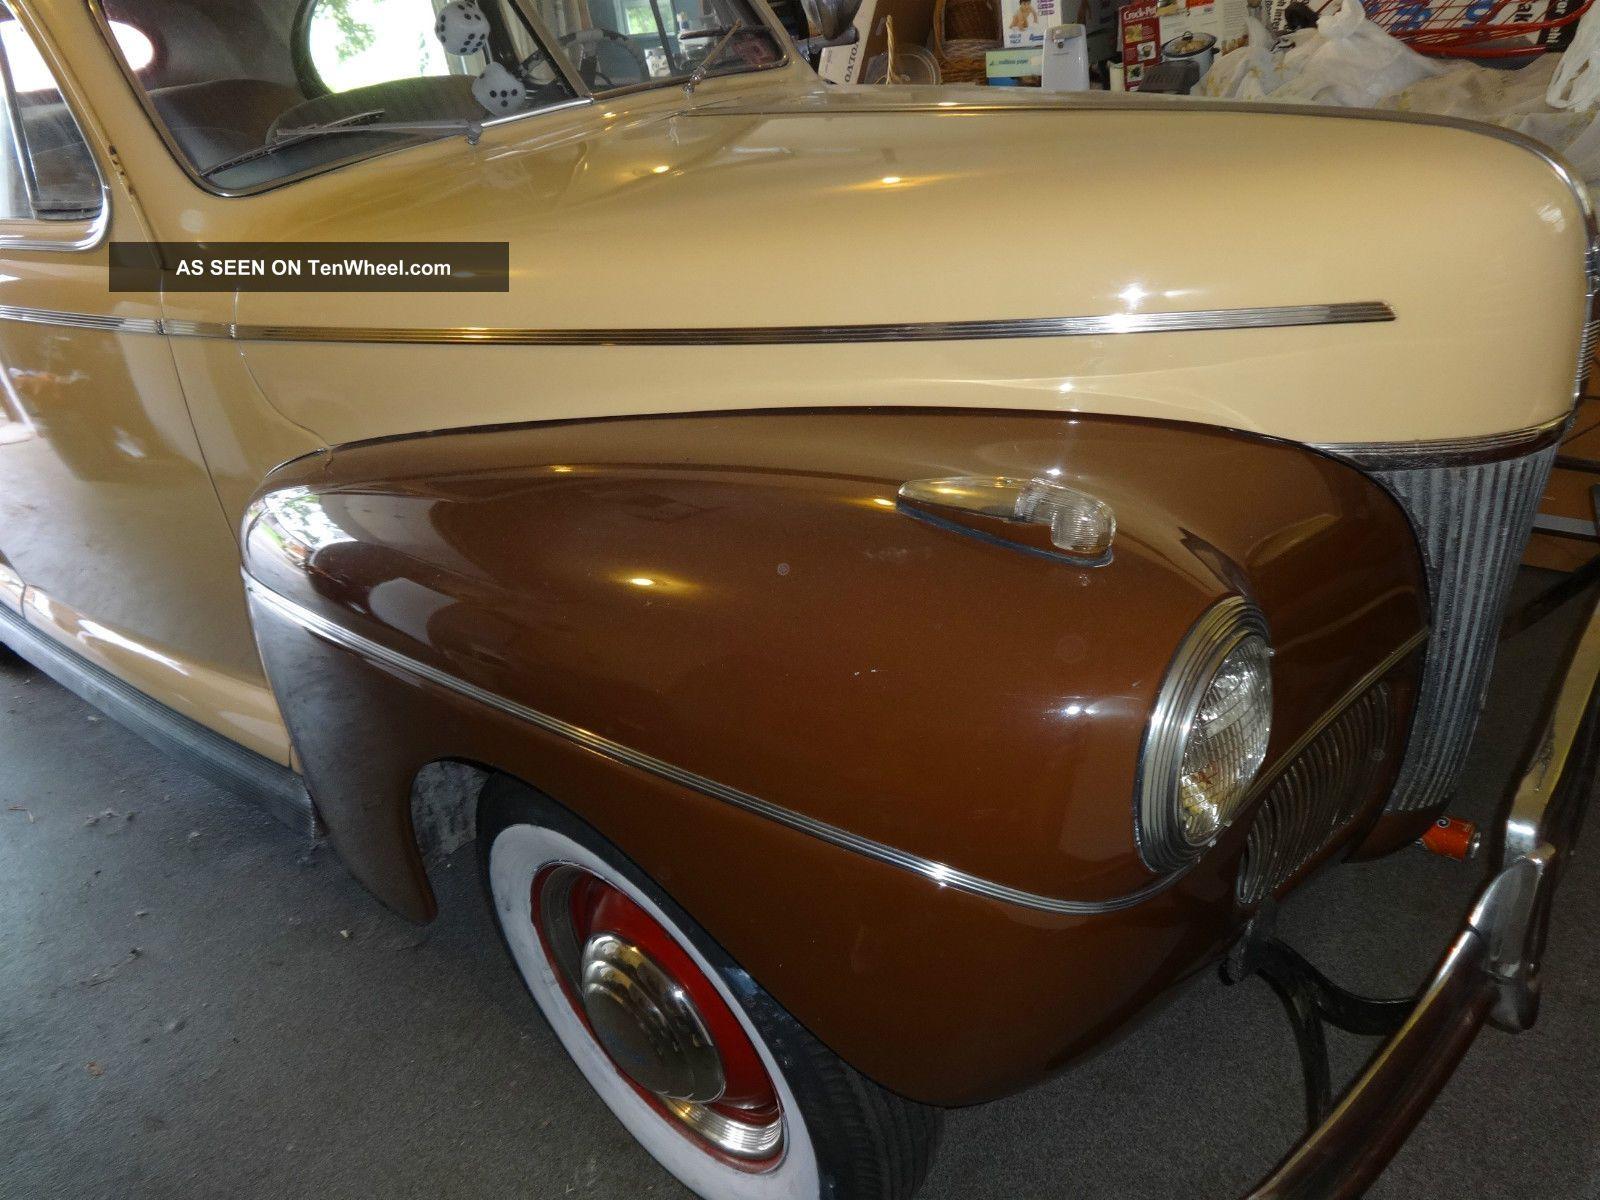 1941 Ford Deluxe 2 Door Sedan Flathead V8 Flatty Hot Rod Cruiser Mercury Engine Potentiol